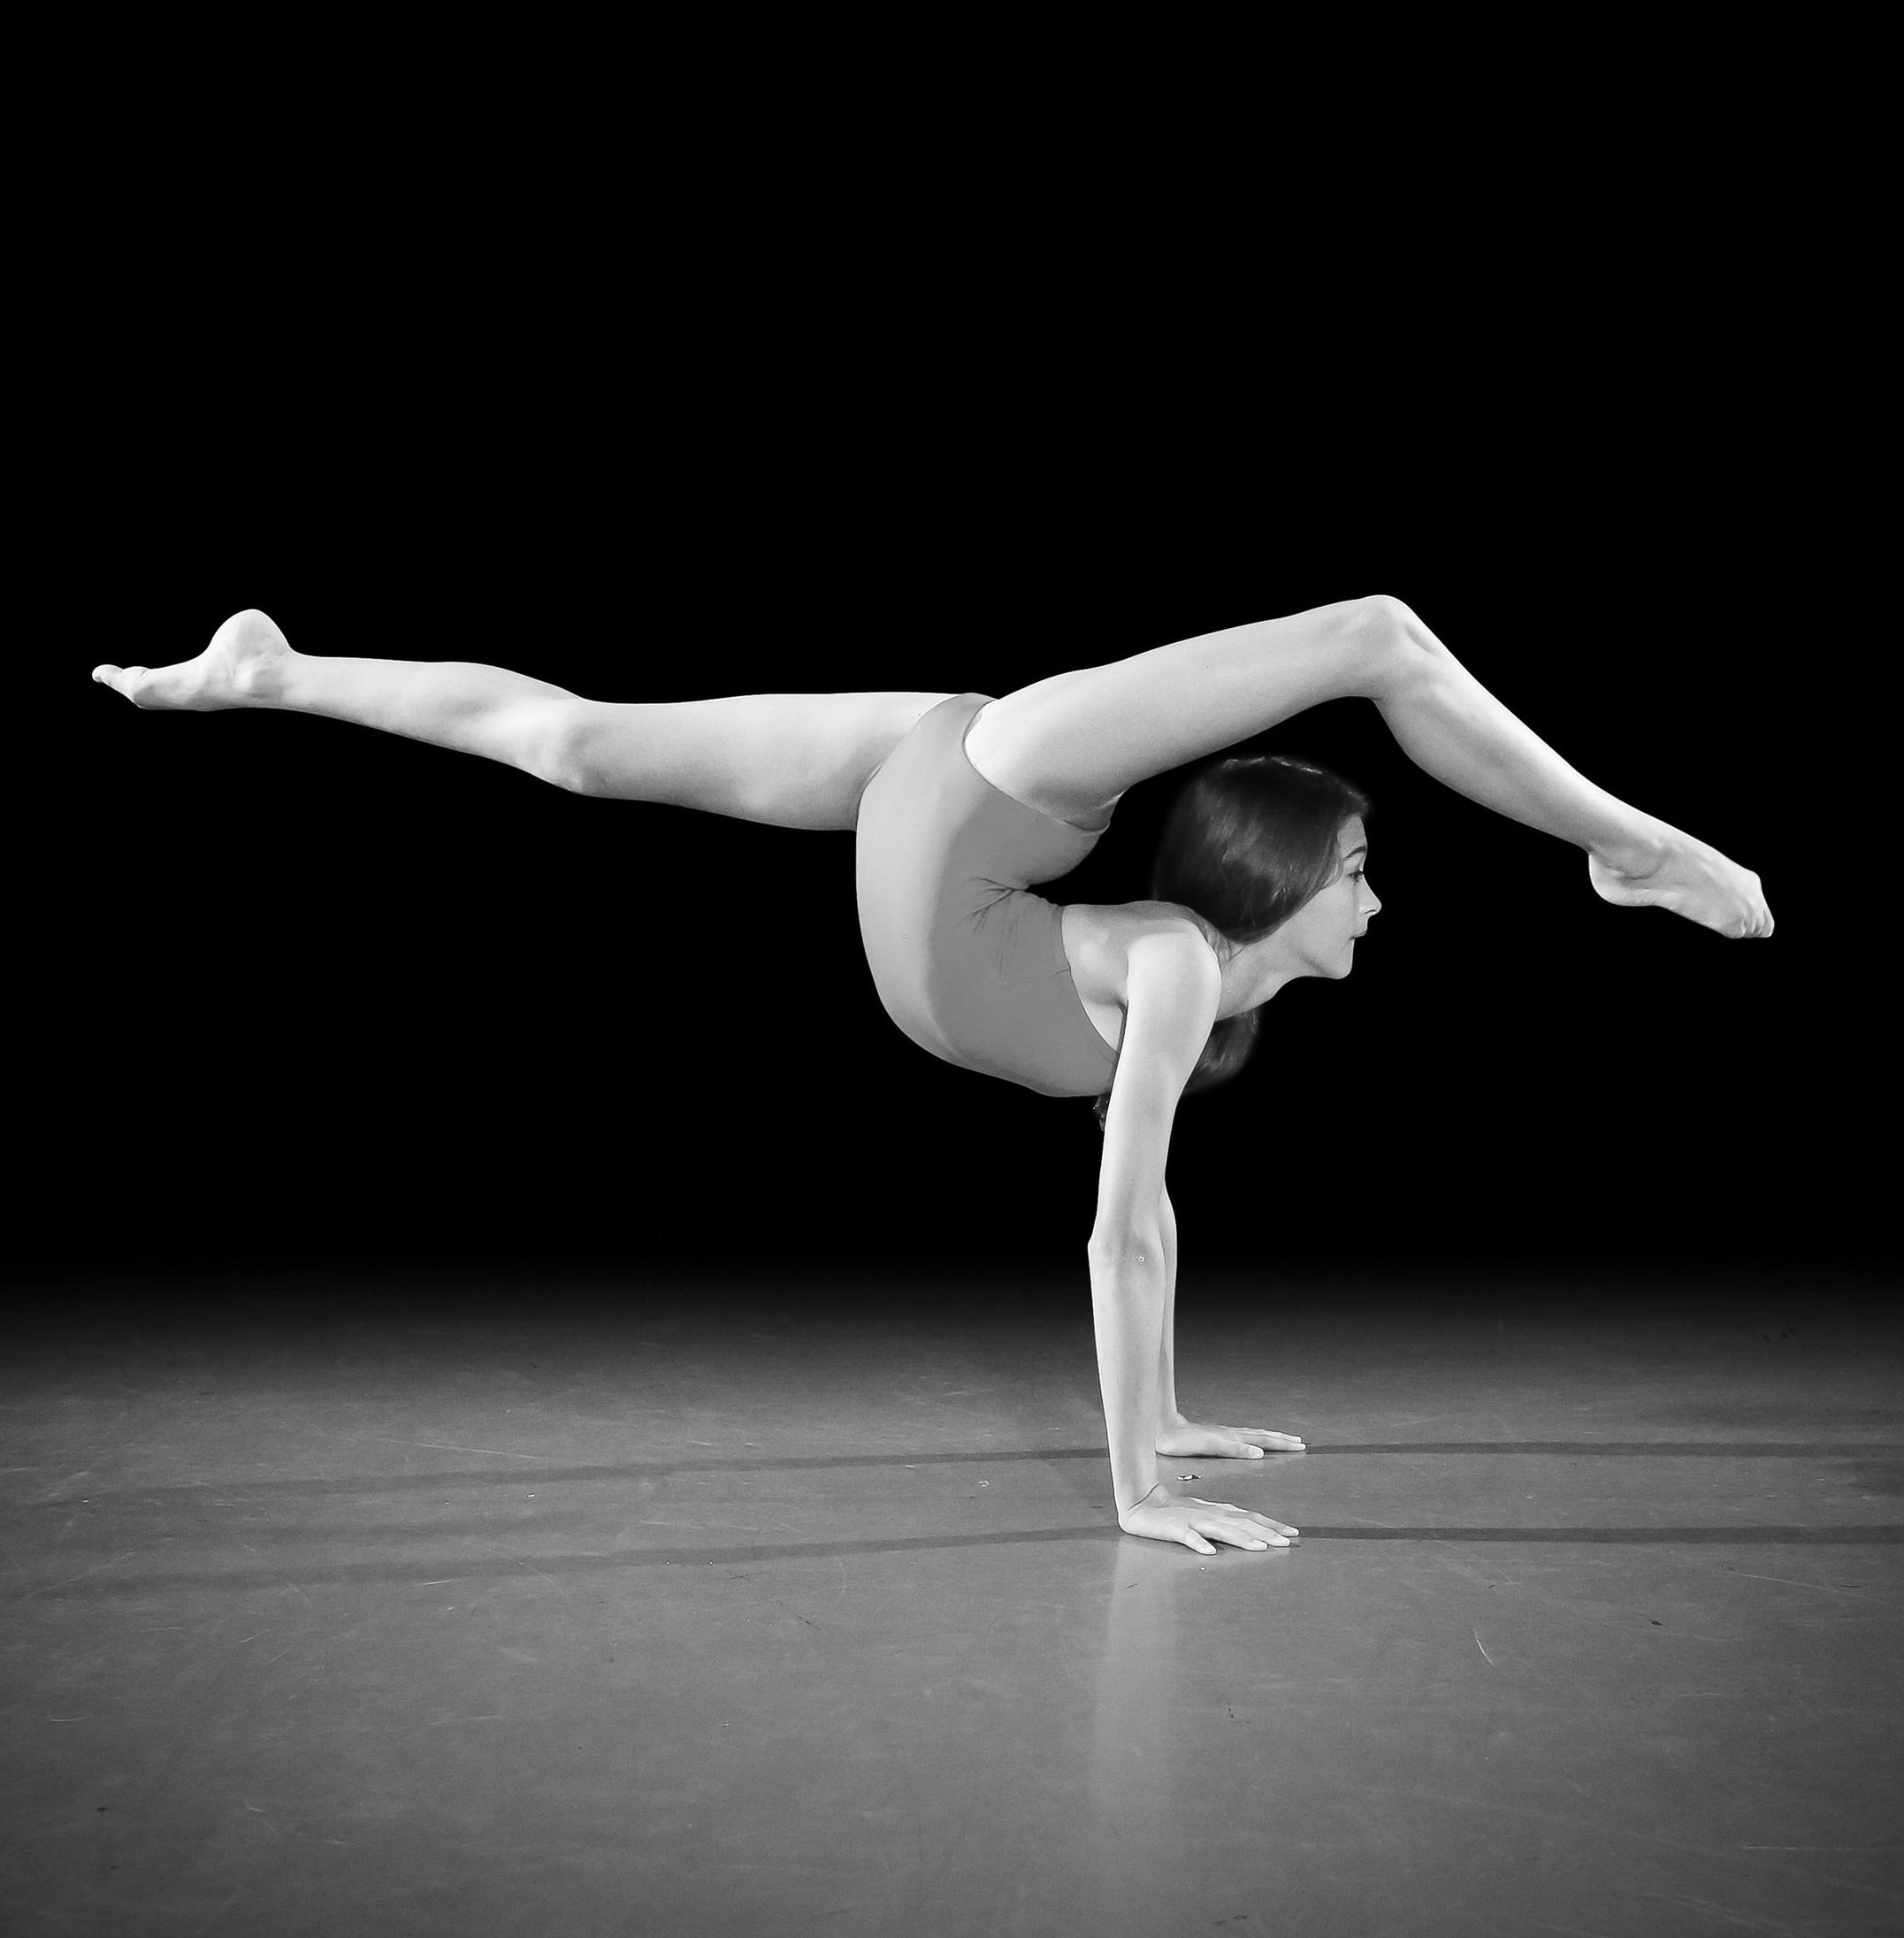 ACRO - acrobatics: strength, flexibility + balance